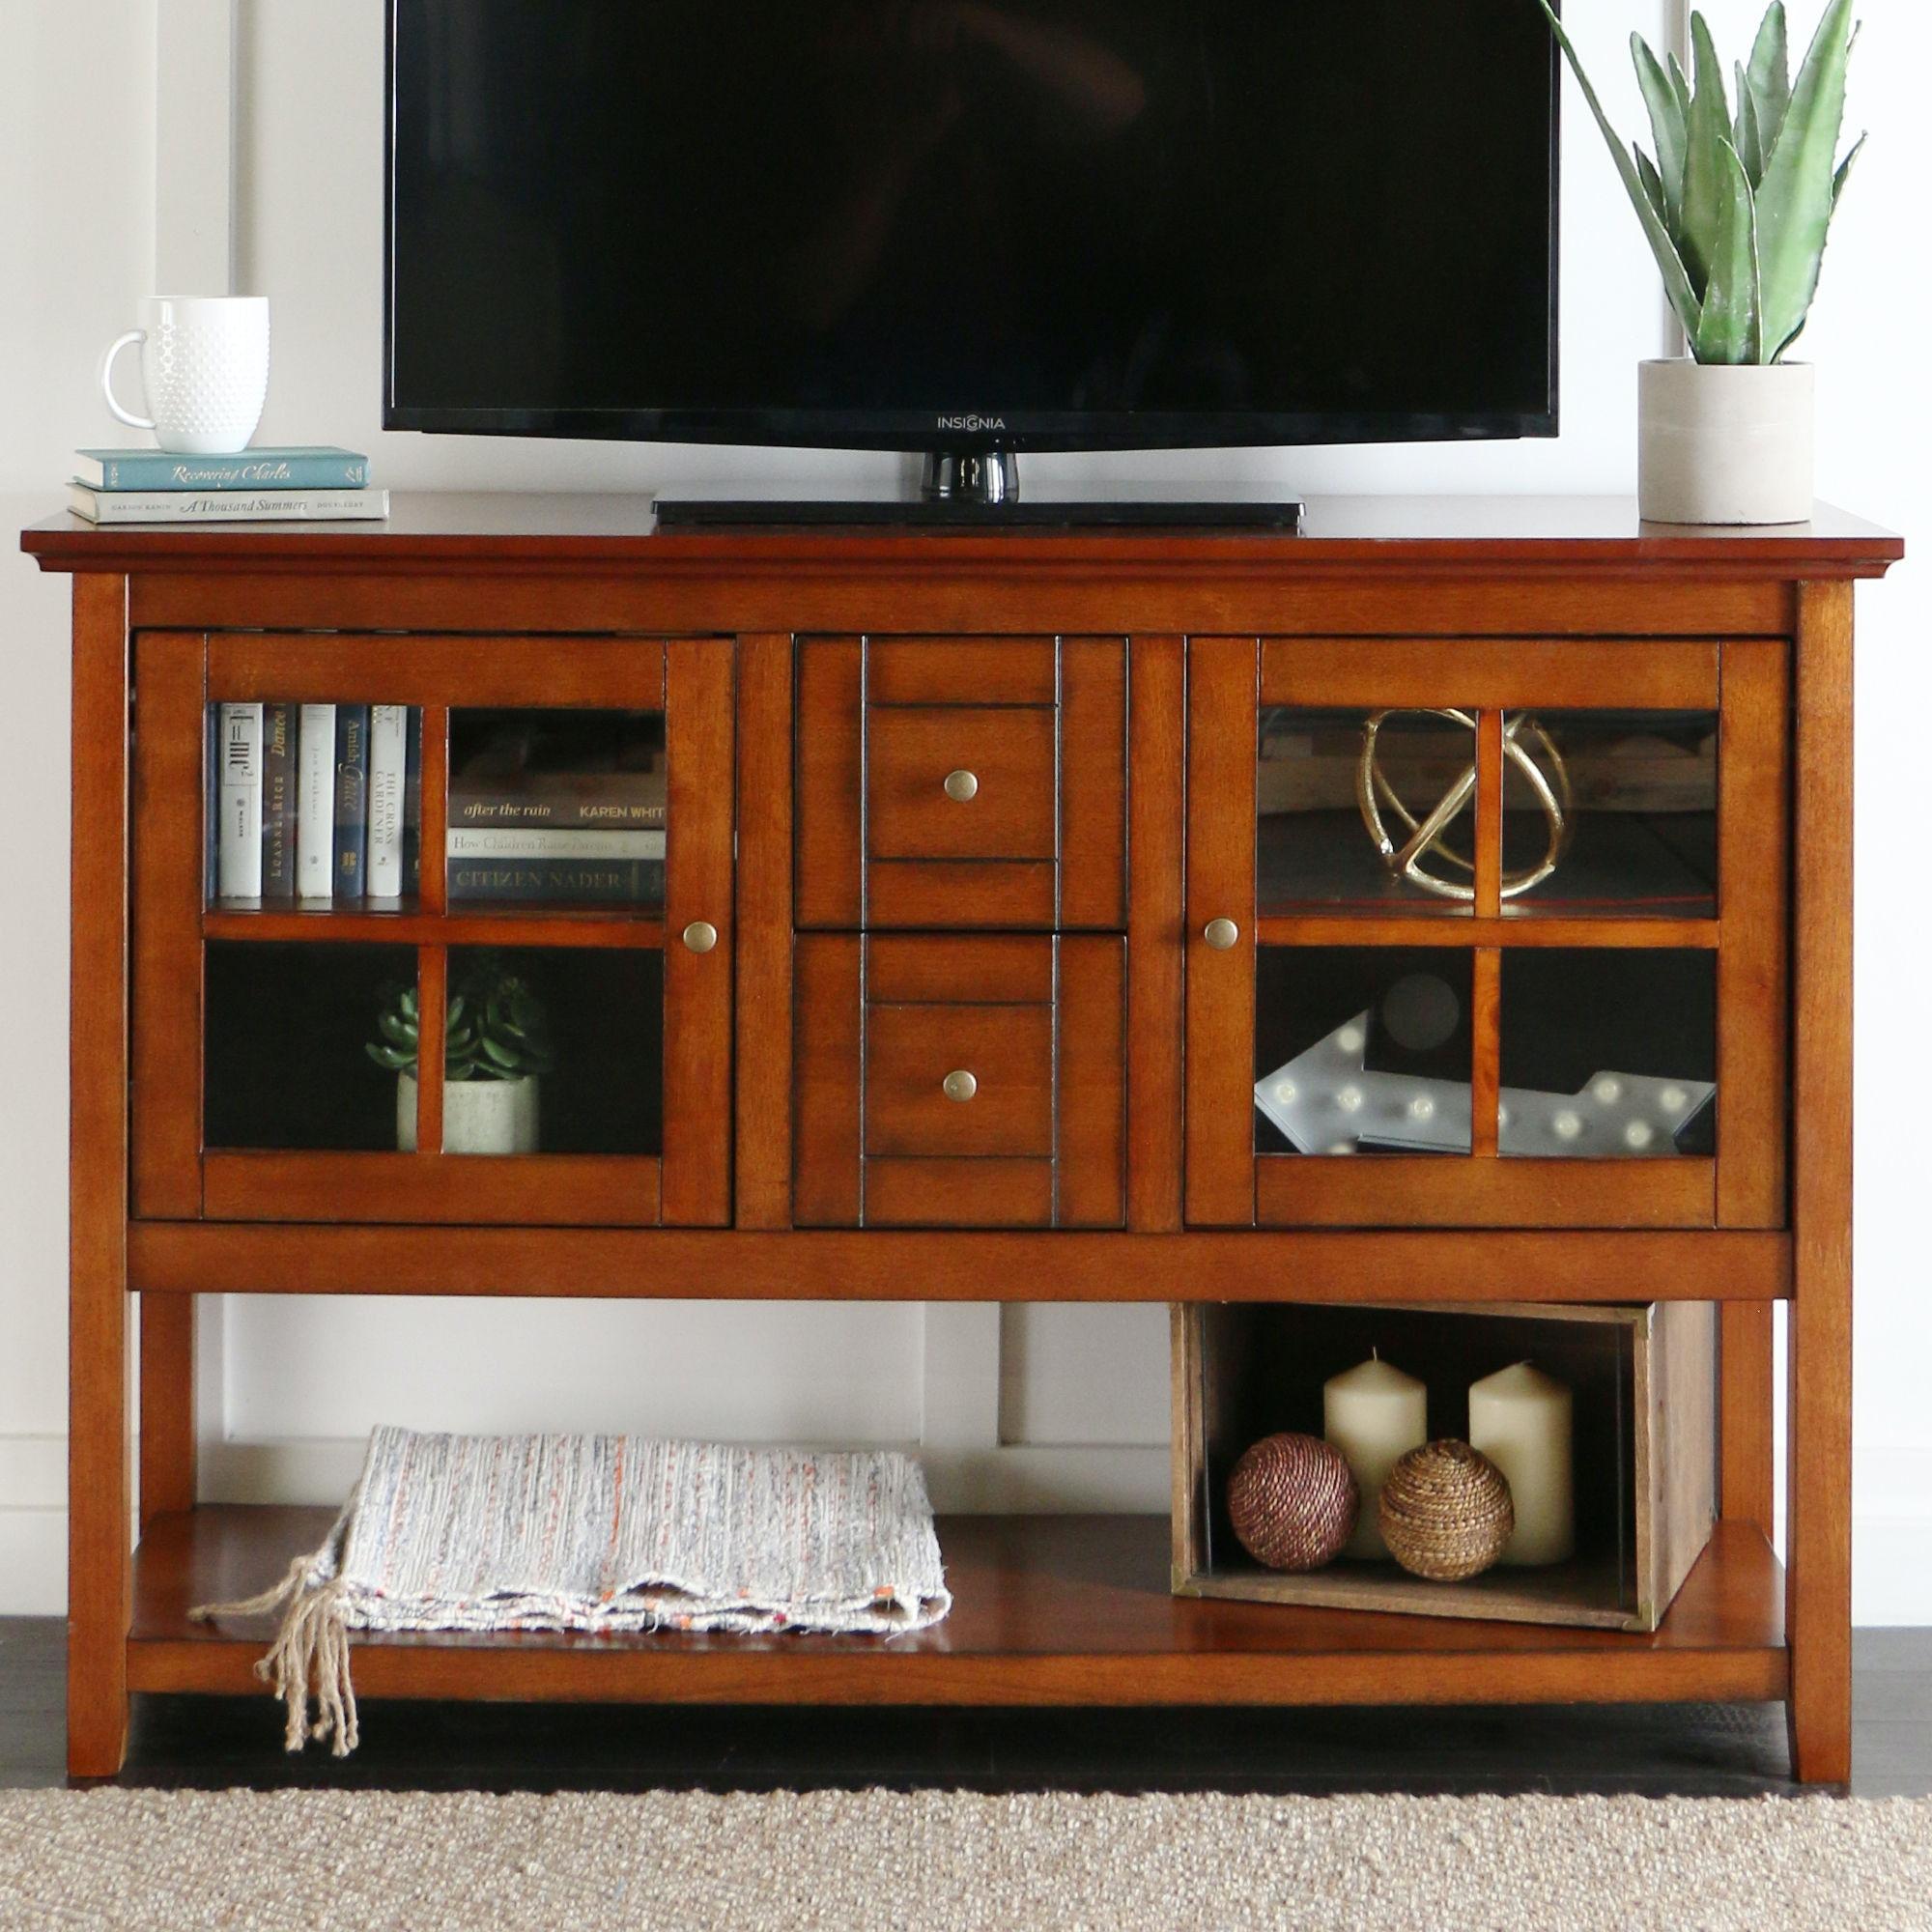 52u0027u0027 Wood Console Table TV Stand